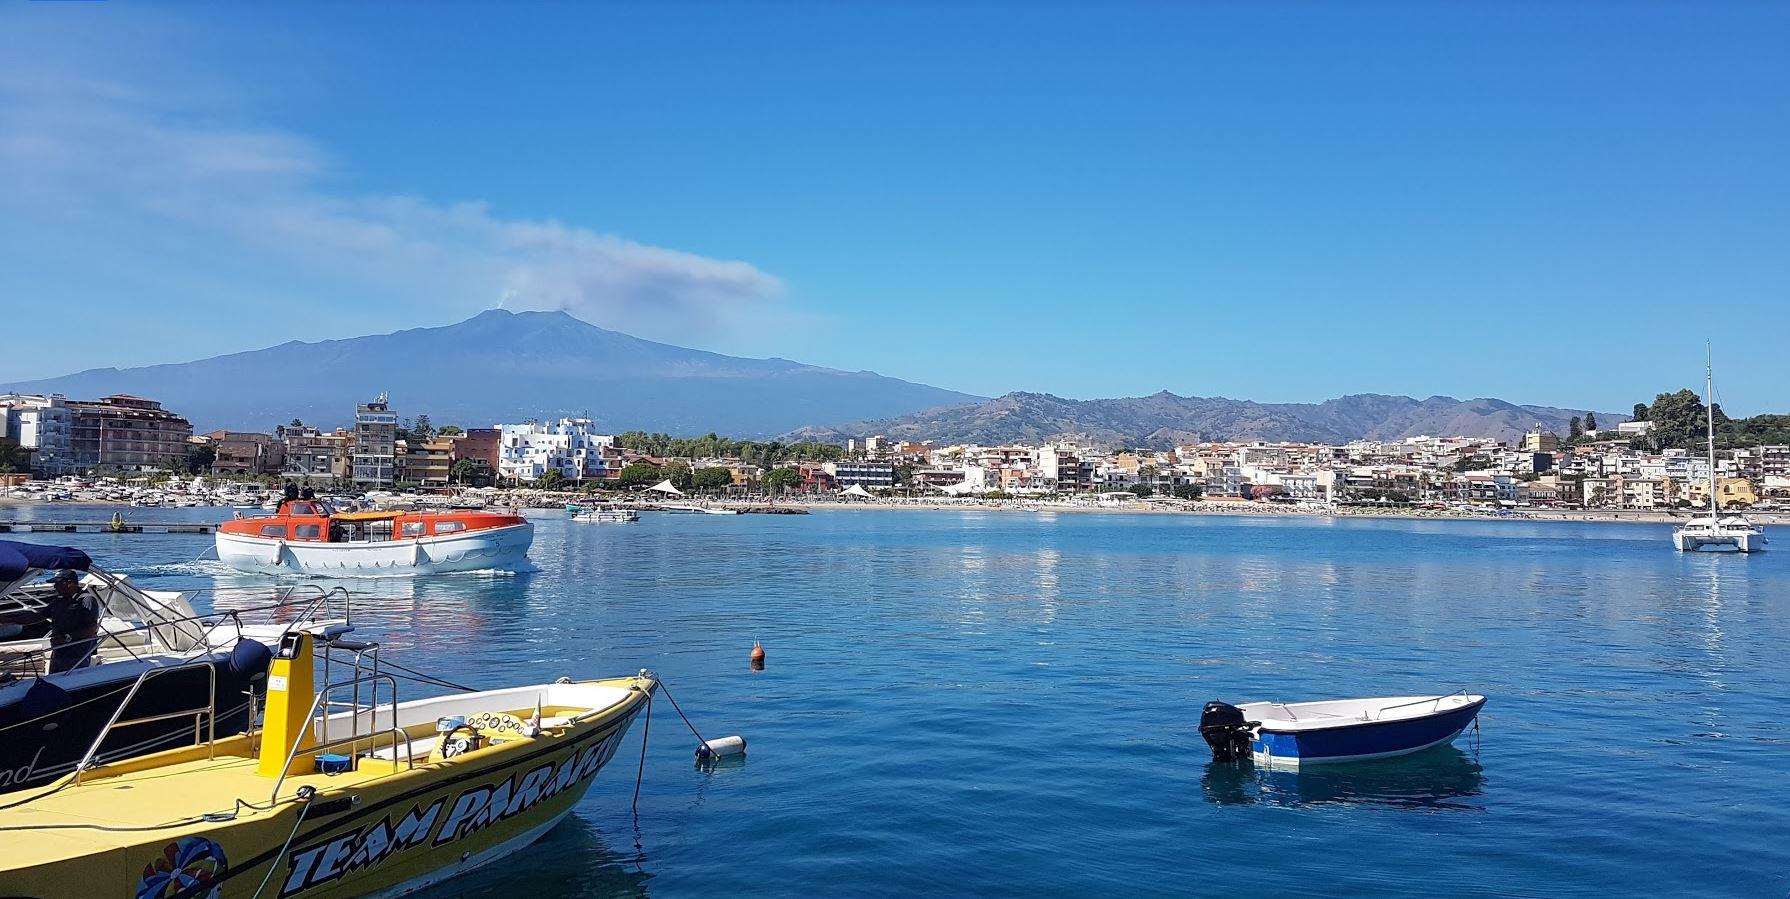 giardini-naxos il paese attaccato a taormina